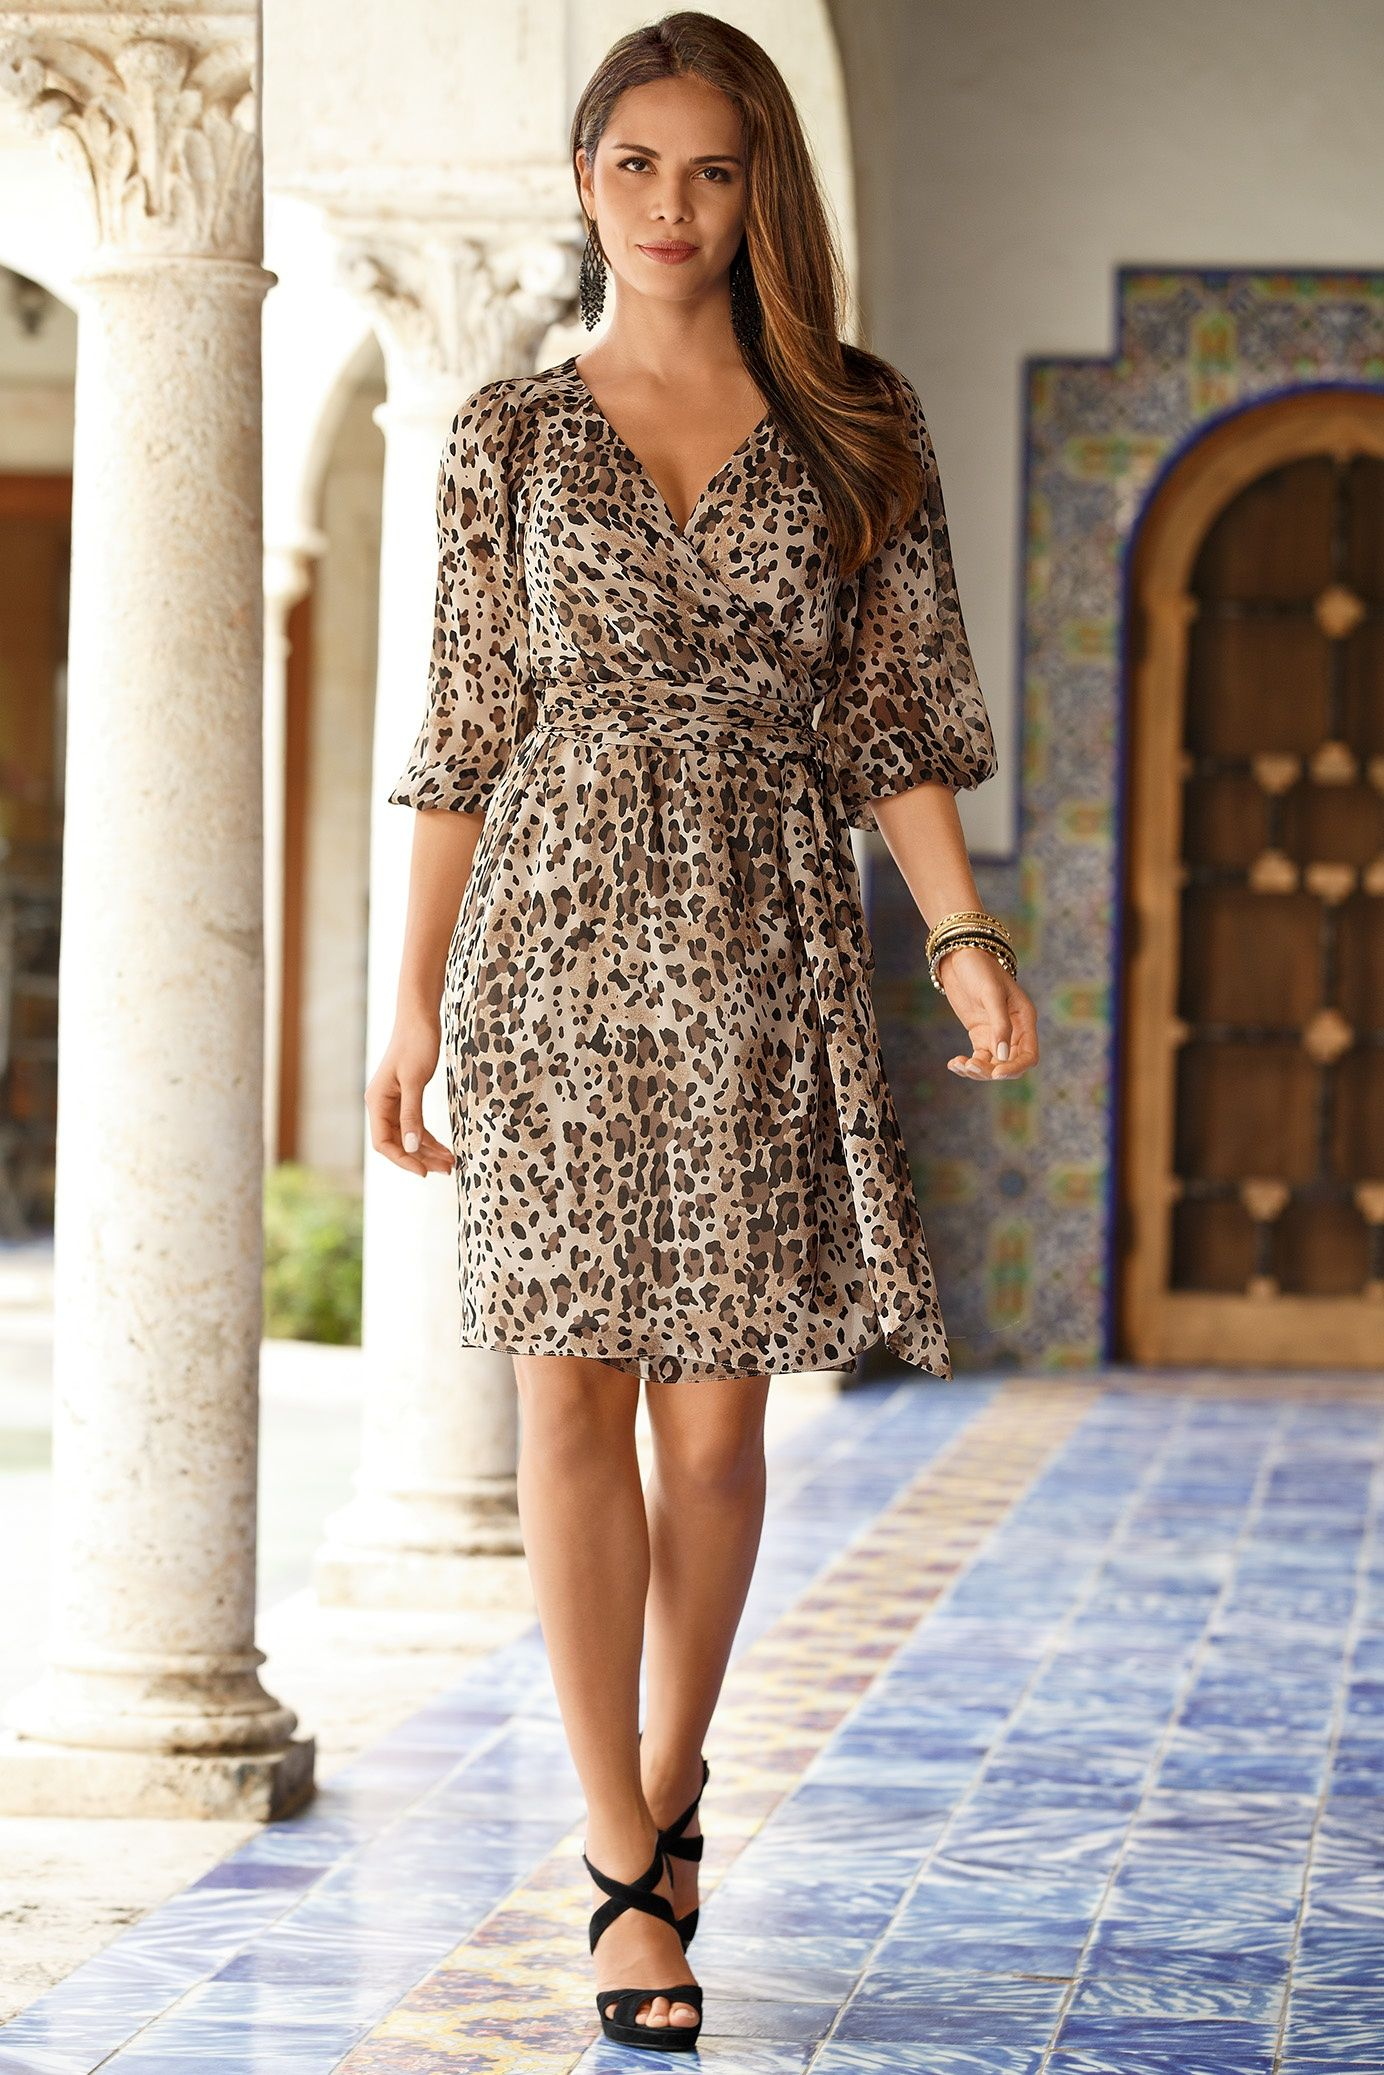 Boston Proper Neutral leopard dress #bostonproper ...